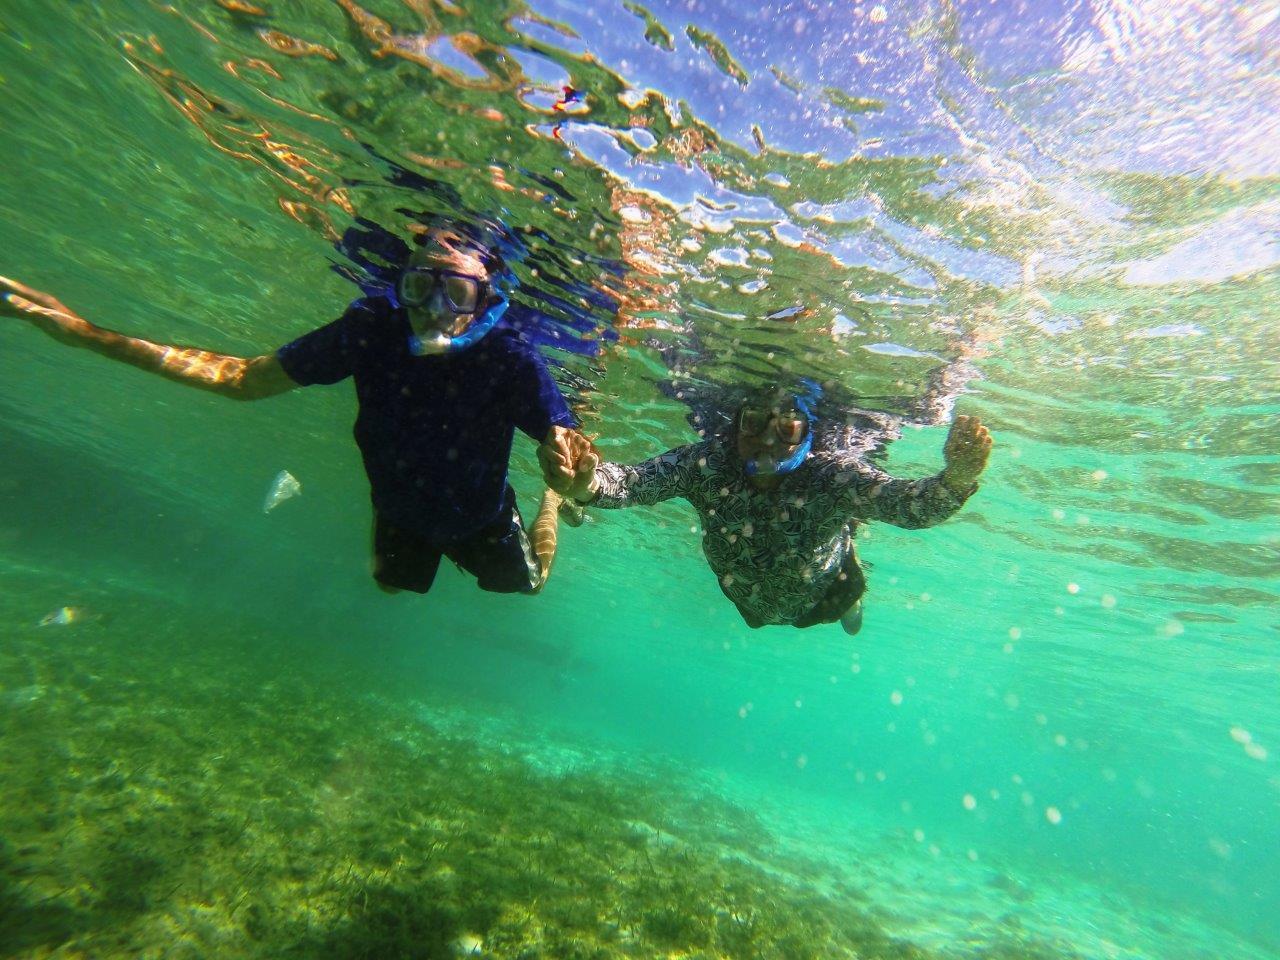 Enjoying some underwater scenery